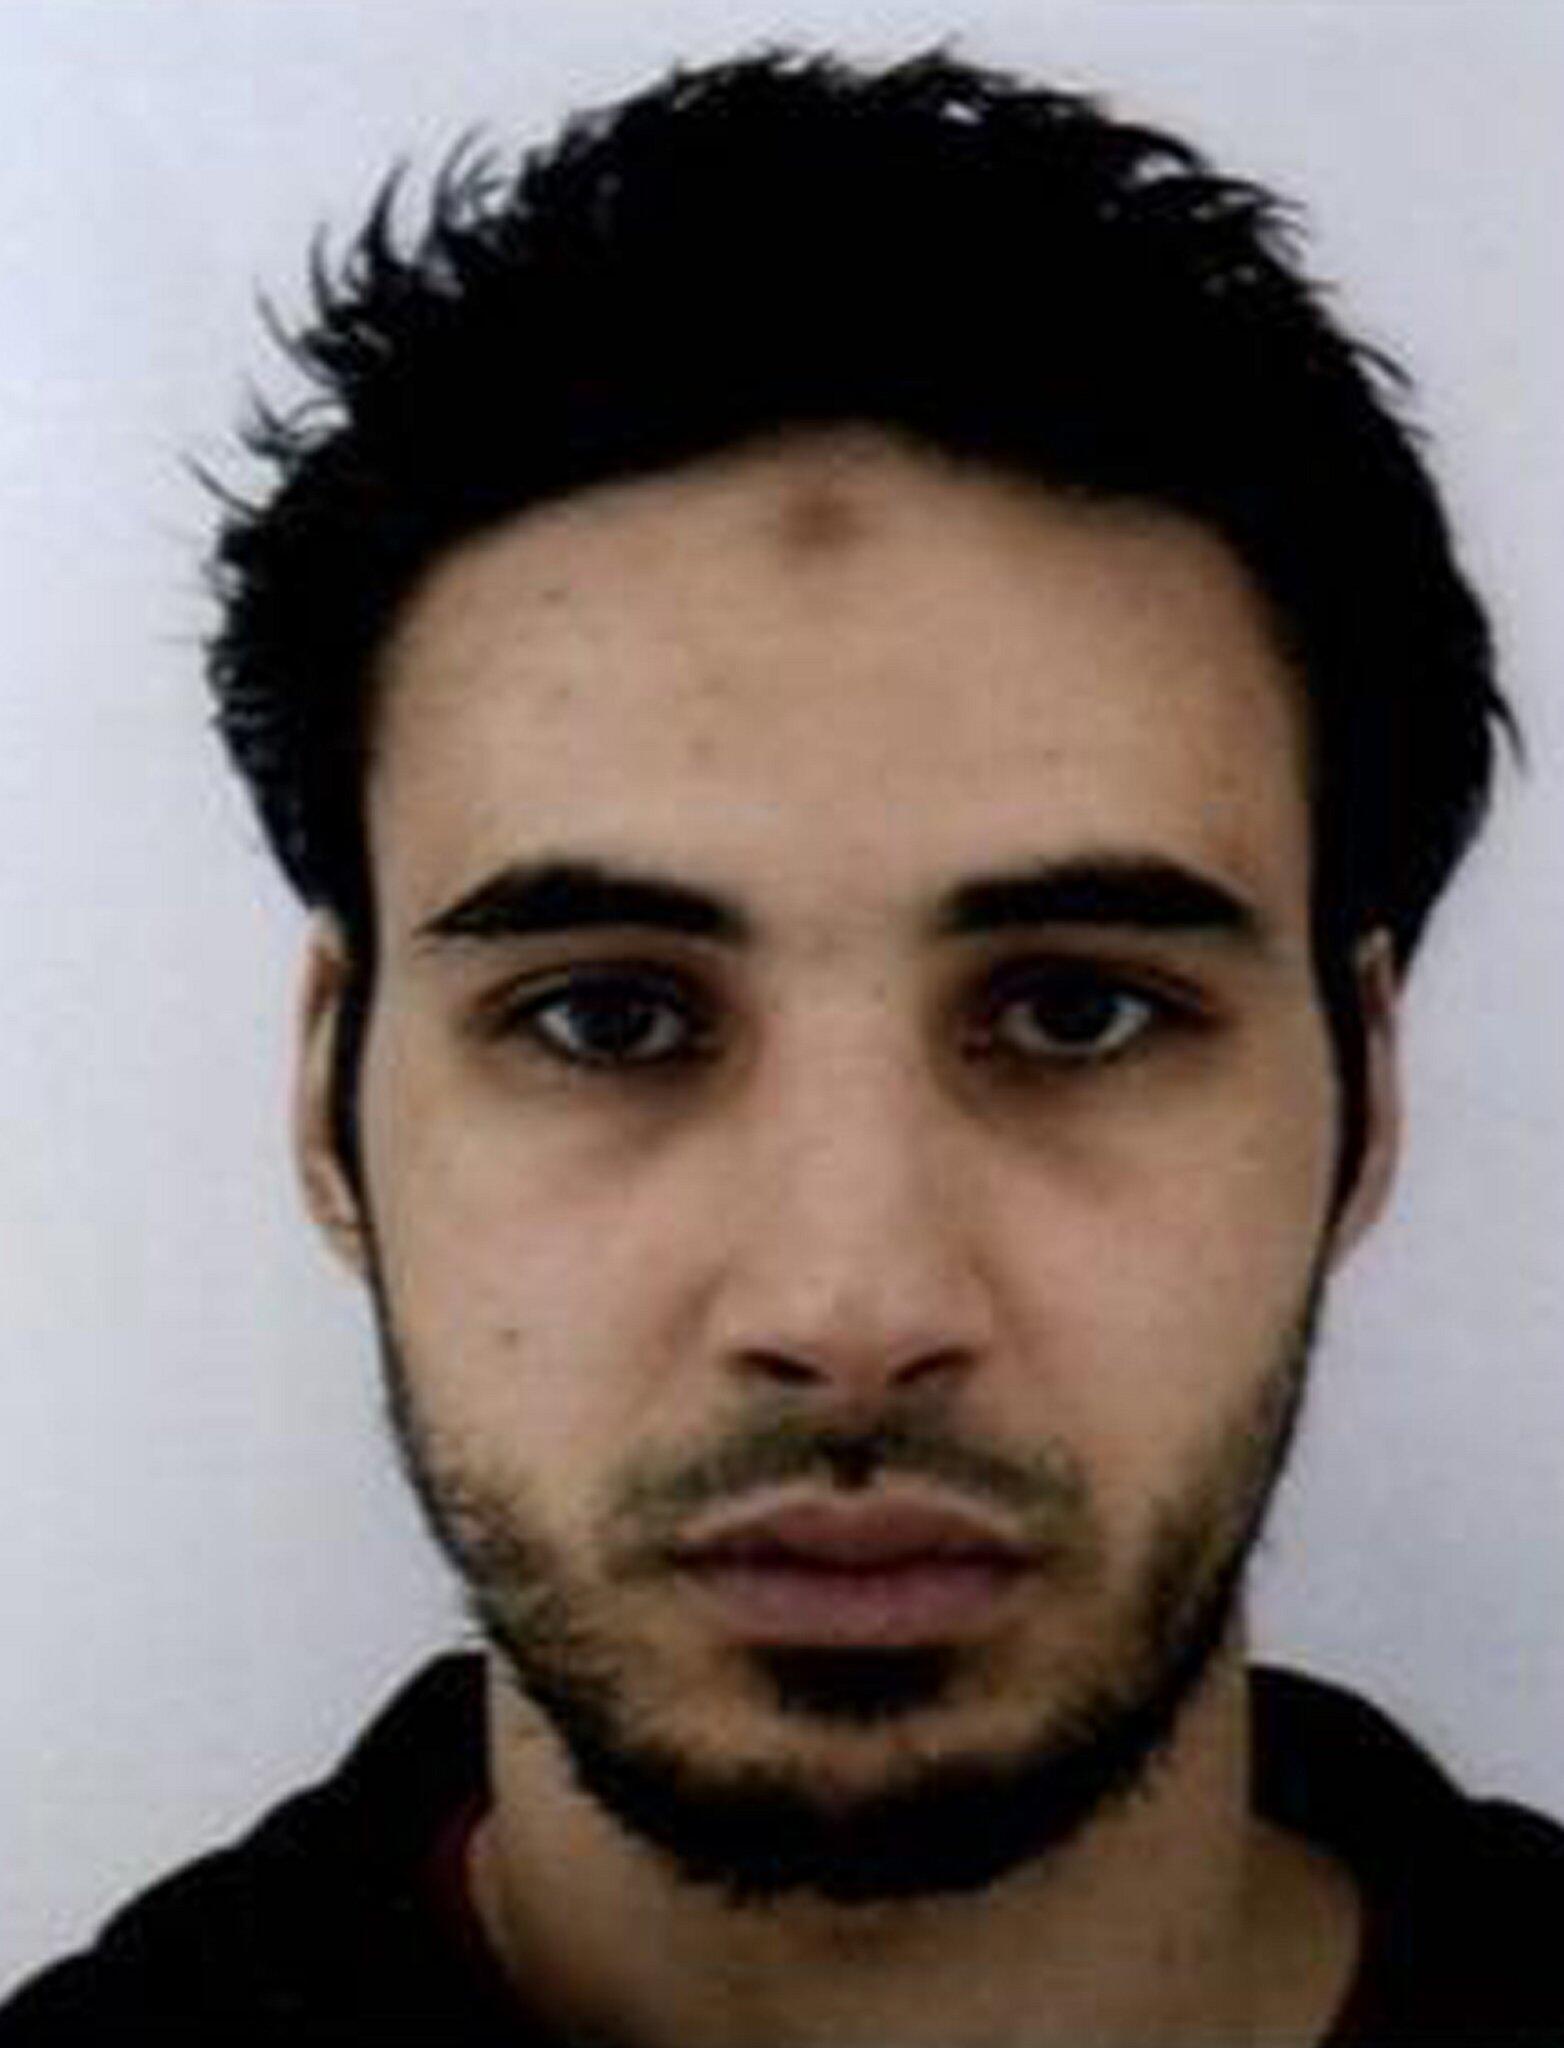 Bild zu Tatverdächtiger des Strassburger Attentats